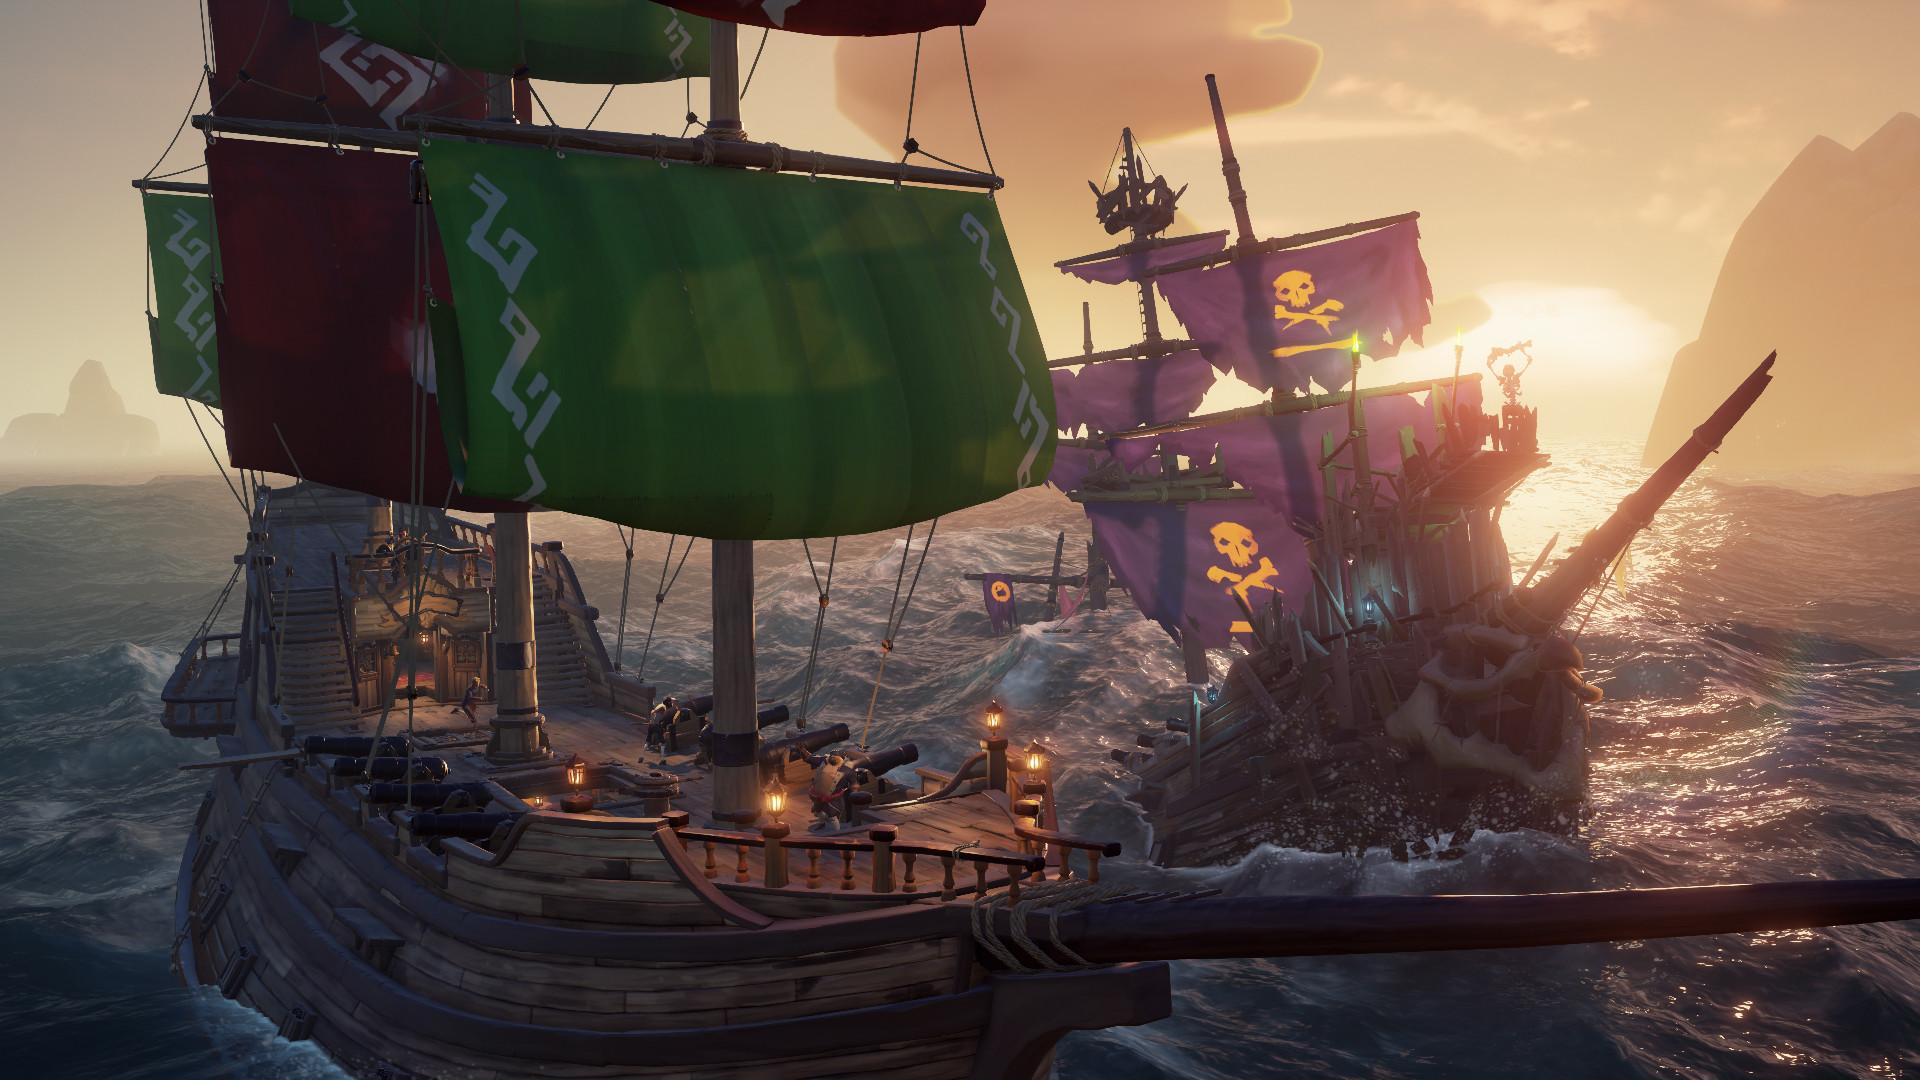 sea of thieves 1 - دانلود بازی آنلاین Sea of Thieves برای کامپیوتر